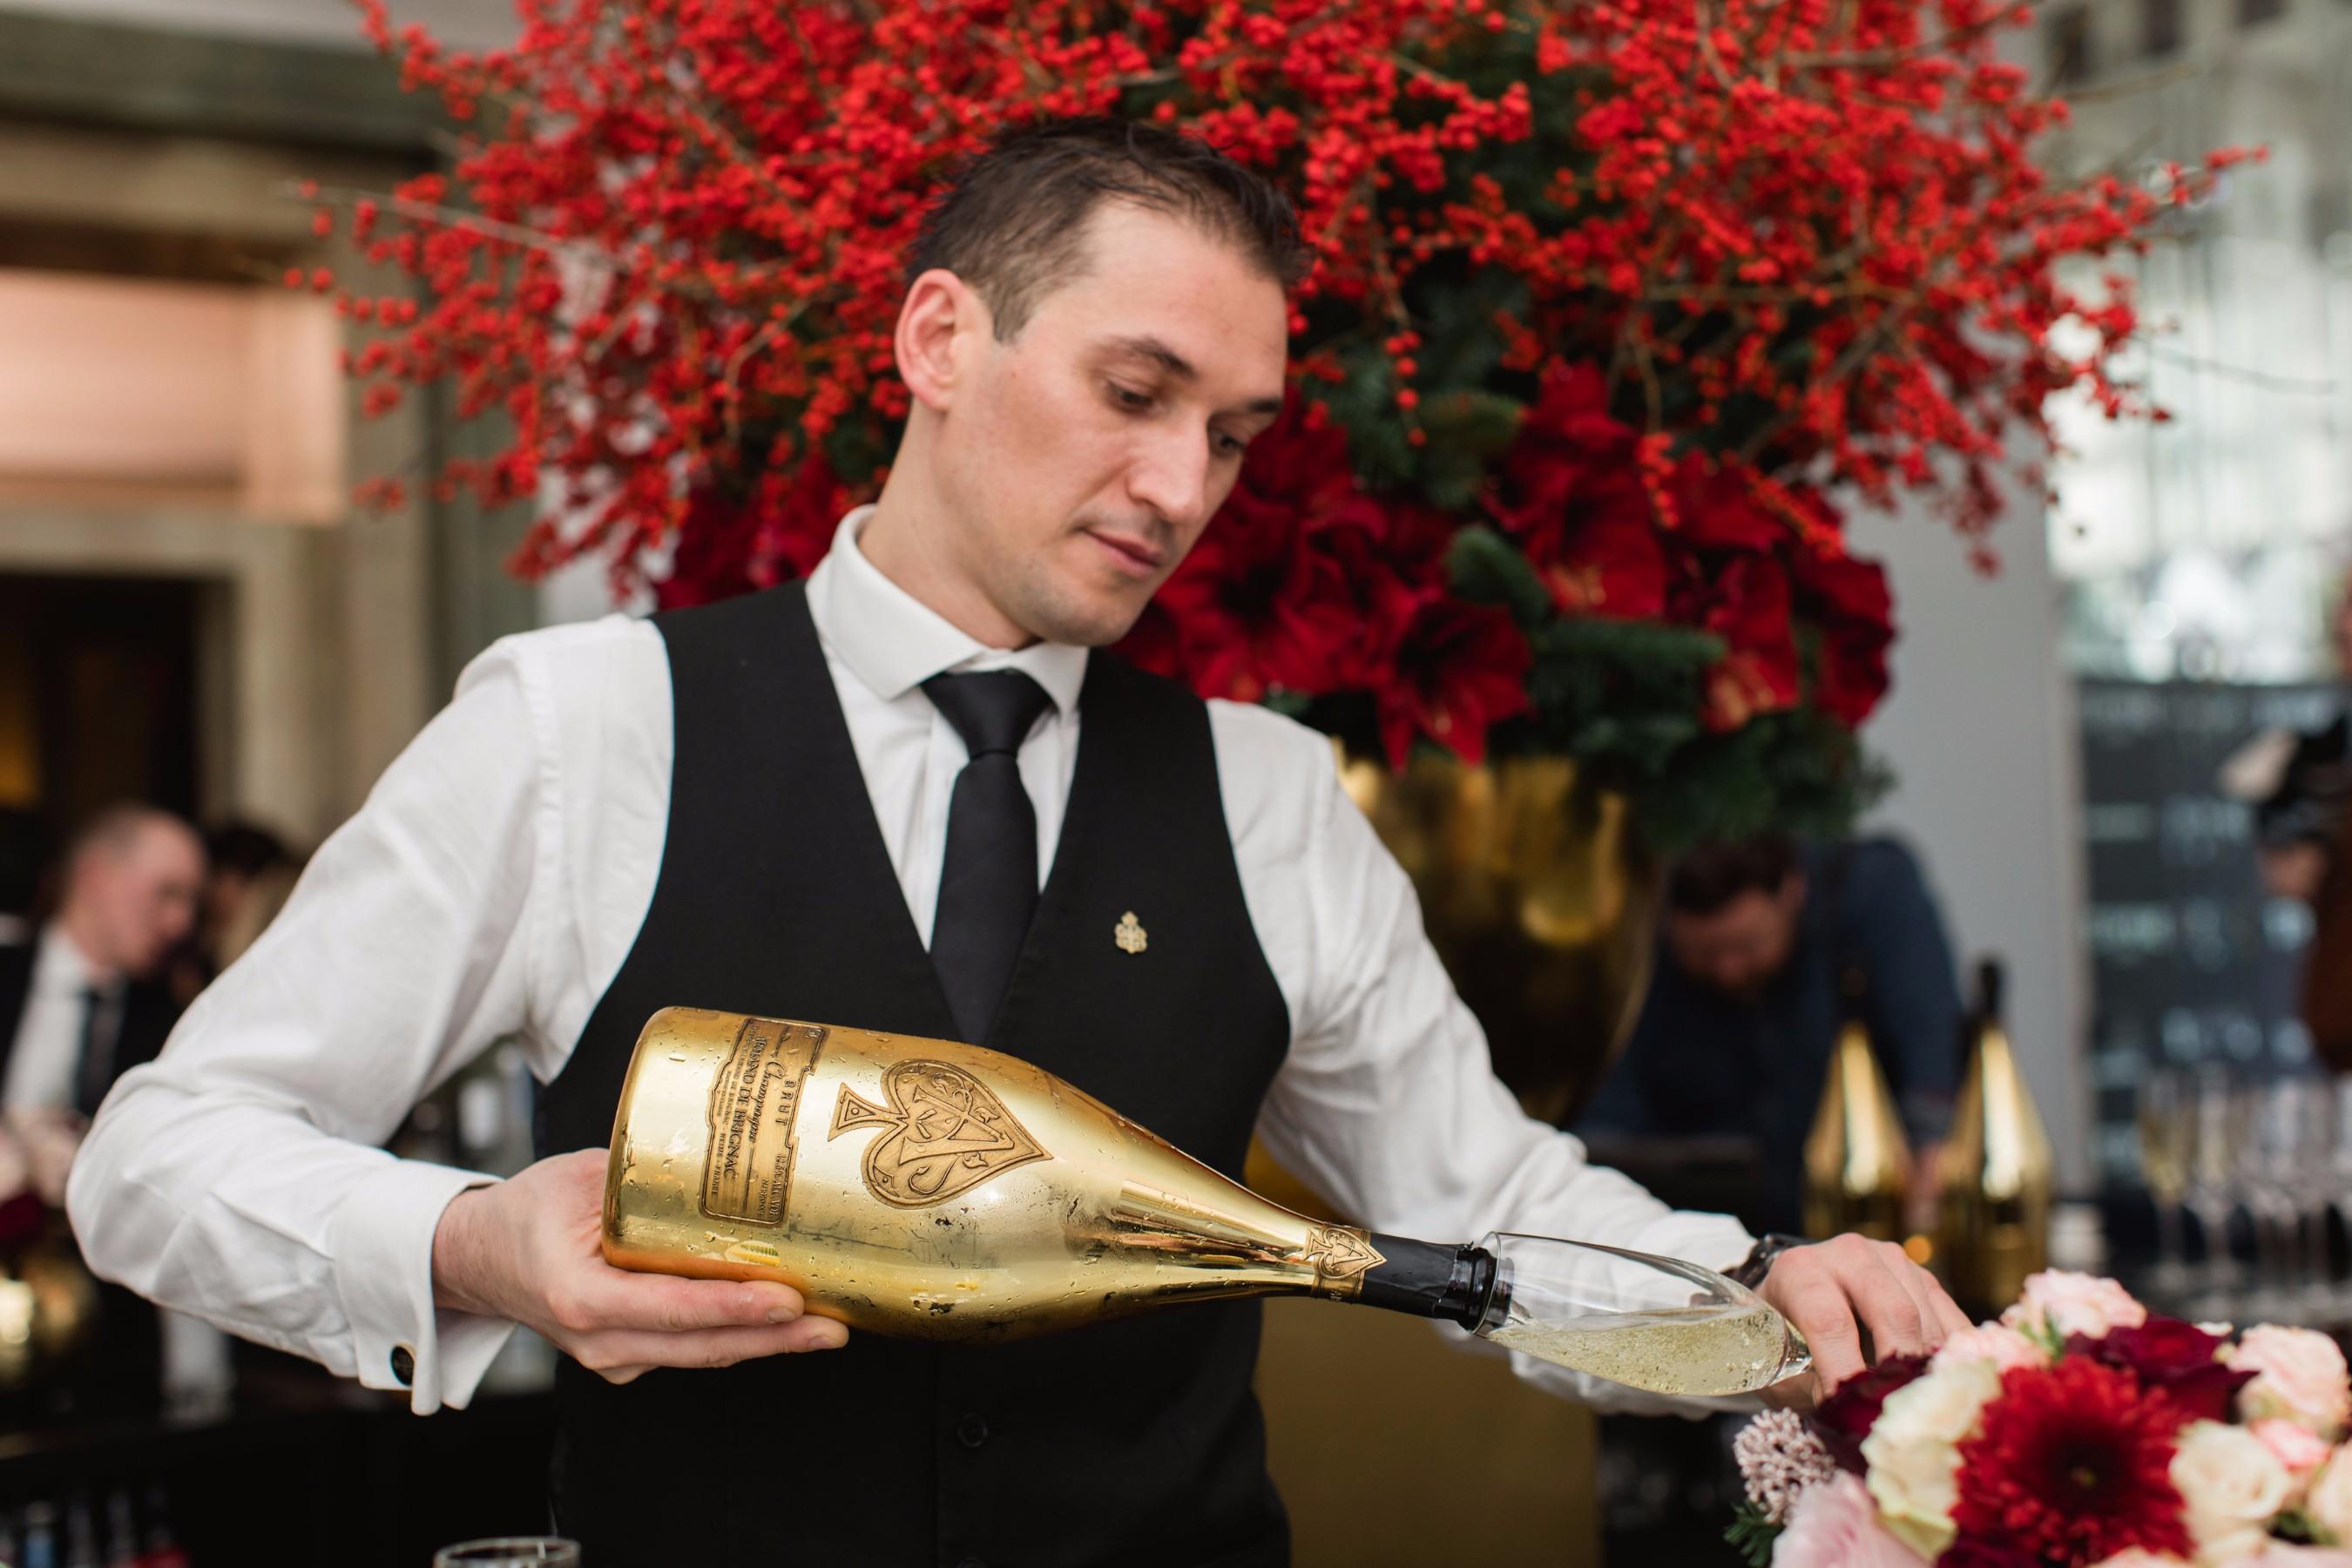 Inside The 2017 Brilliant Is Beautiful Gala at Claridge's, London - Armand de Brignac Champagne